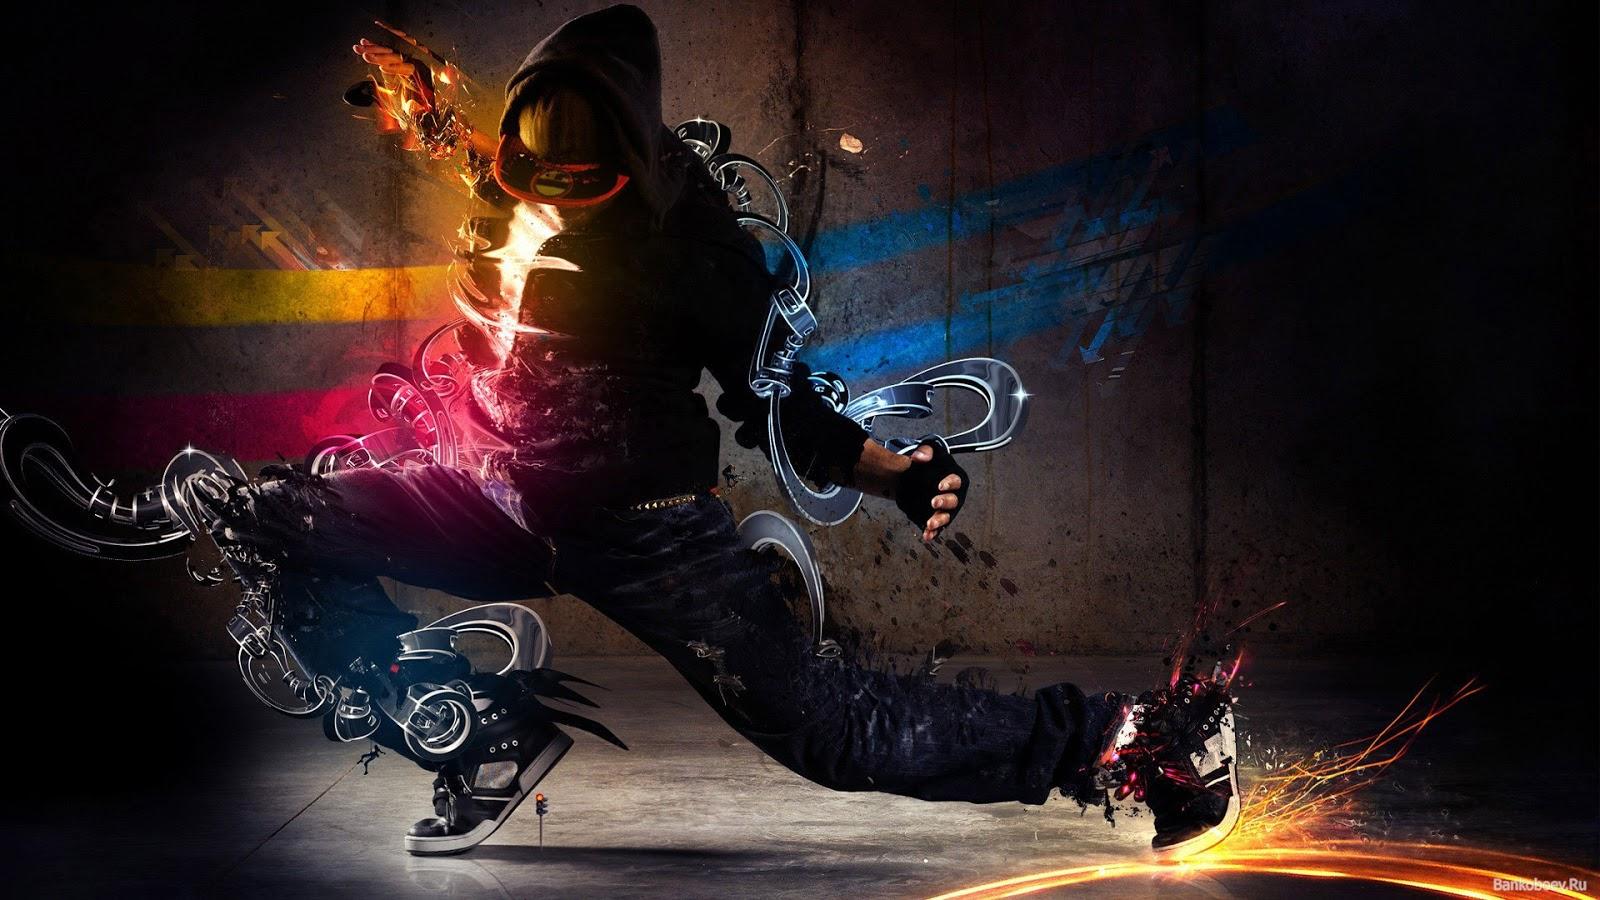 3D Dance HD Wallpapers Backgrounds 2012-2013